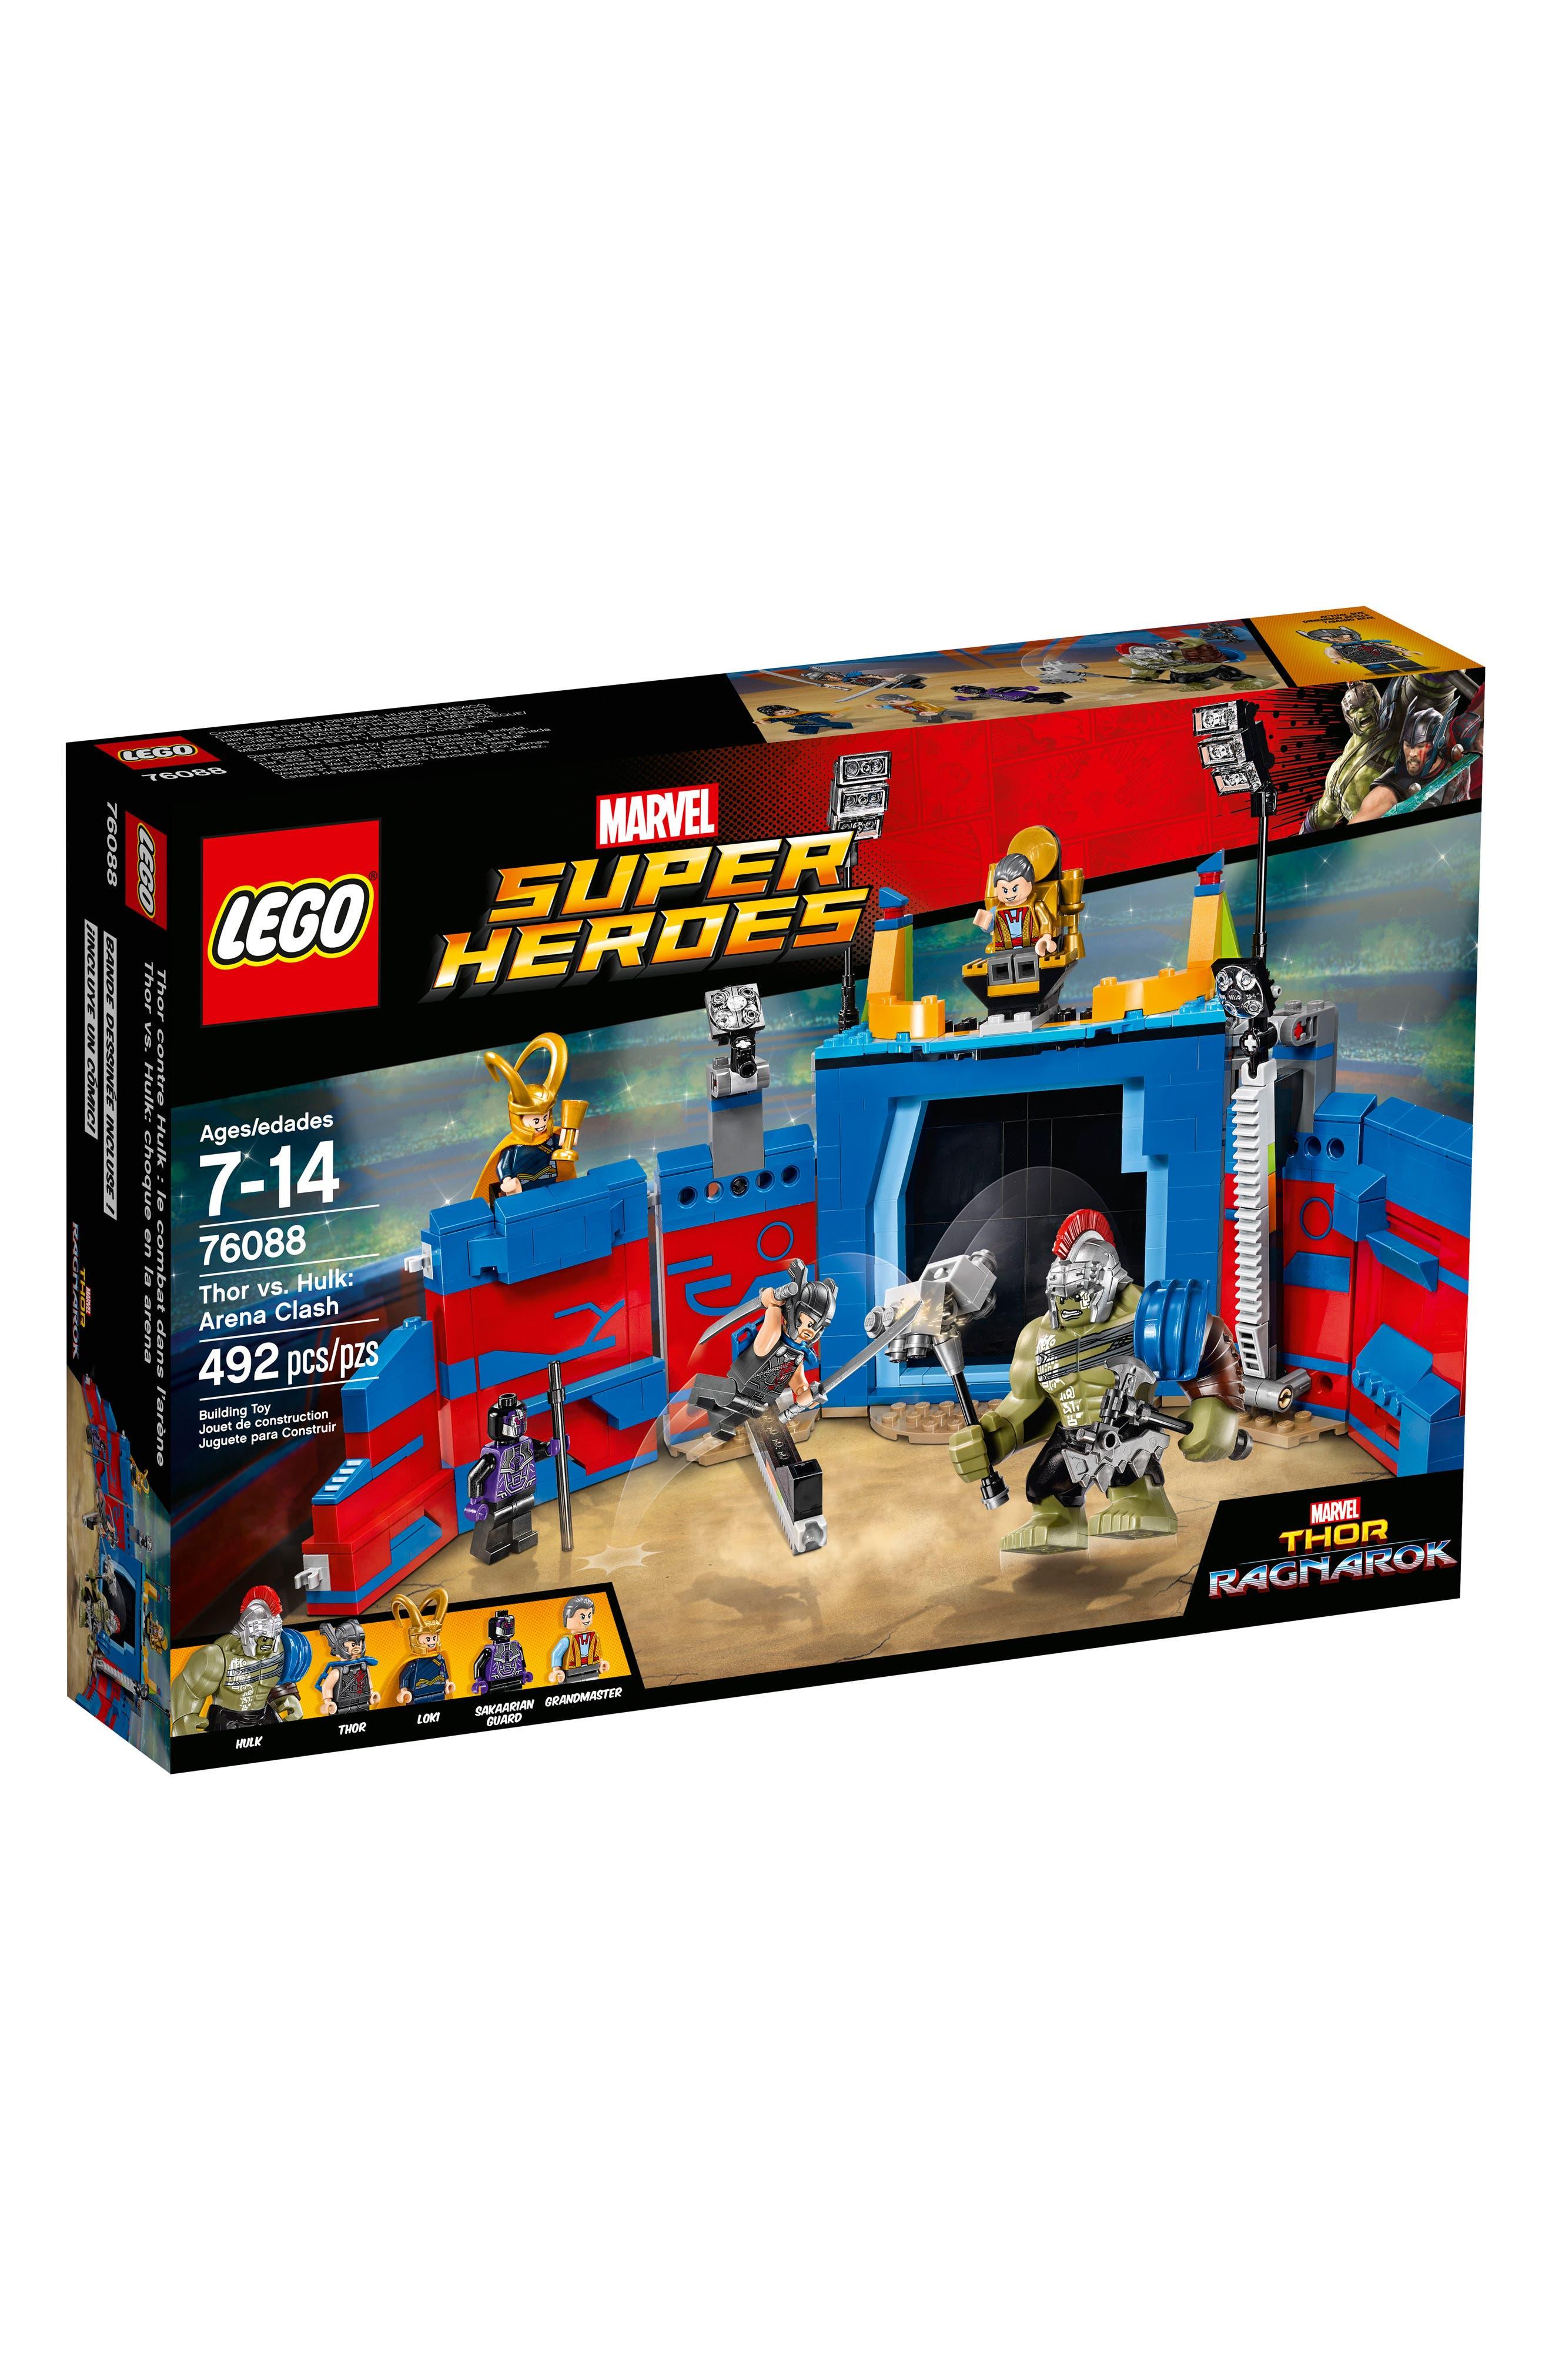 Main Image - LEGO® Marvel Super Heroes Thor vs. Hulk: Arena Clash Play Set - 76088